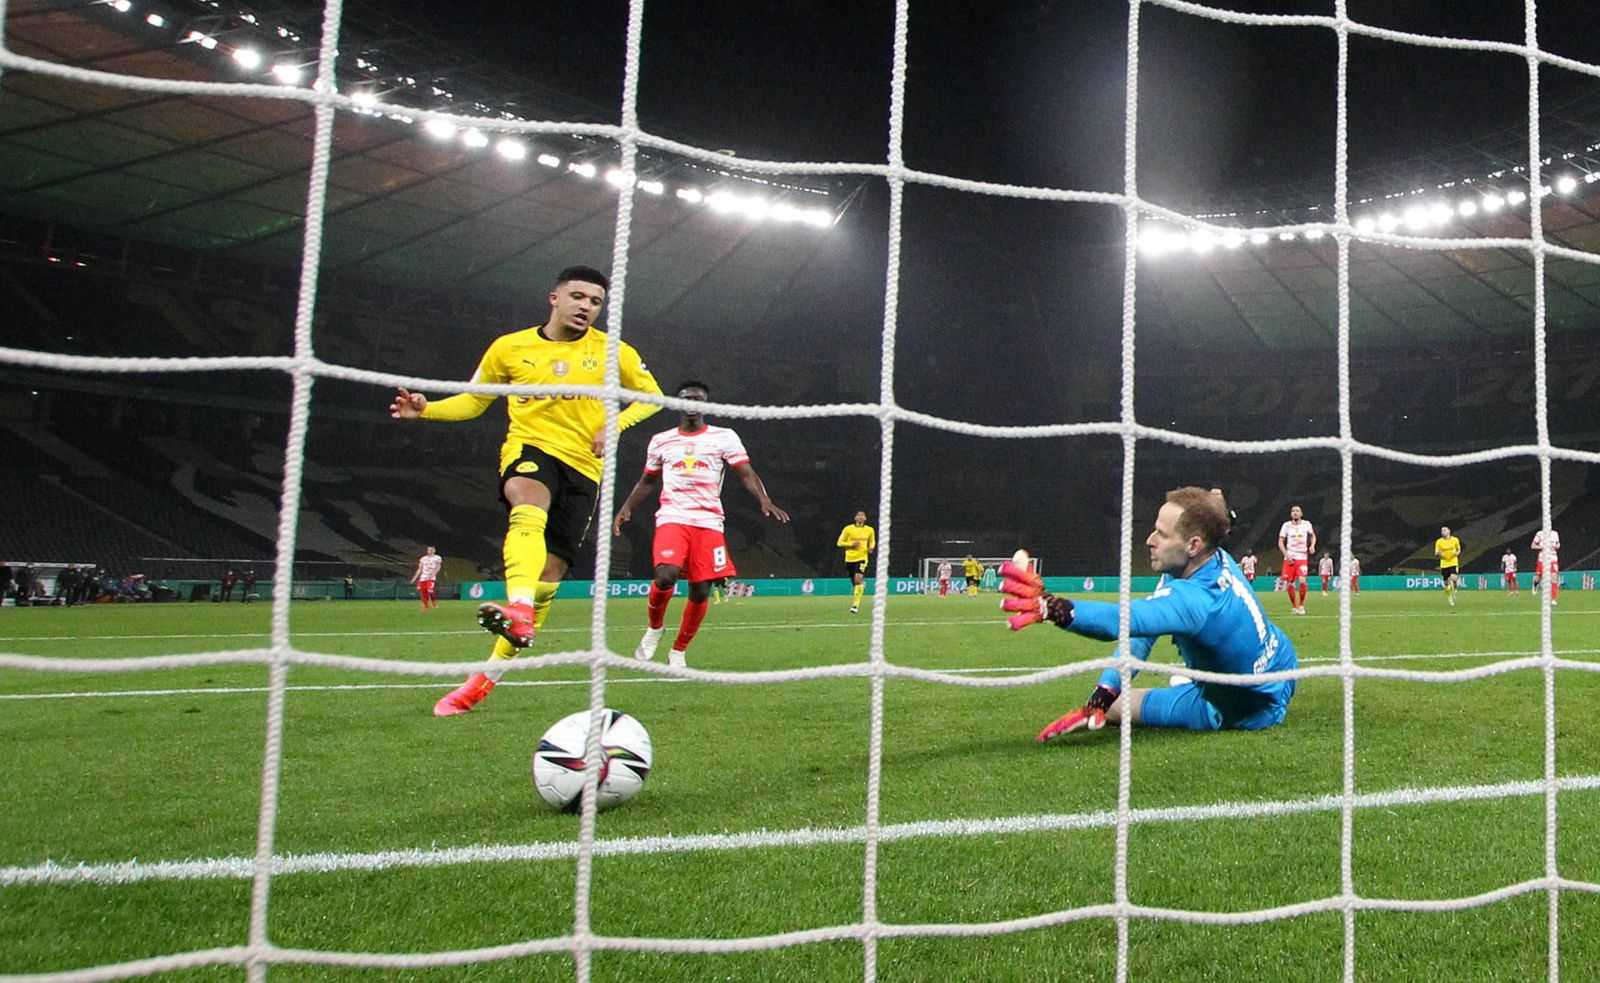 Pokalfinale / RB Leipzig - Dortmund / 13.05.2021 Berlin, 13.05.2021, Olympiastadion, Fussball, DFB - Pokalfinale , RB Le